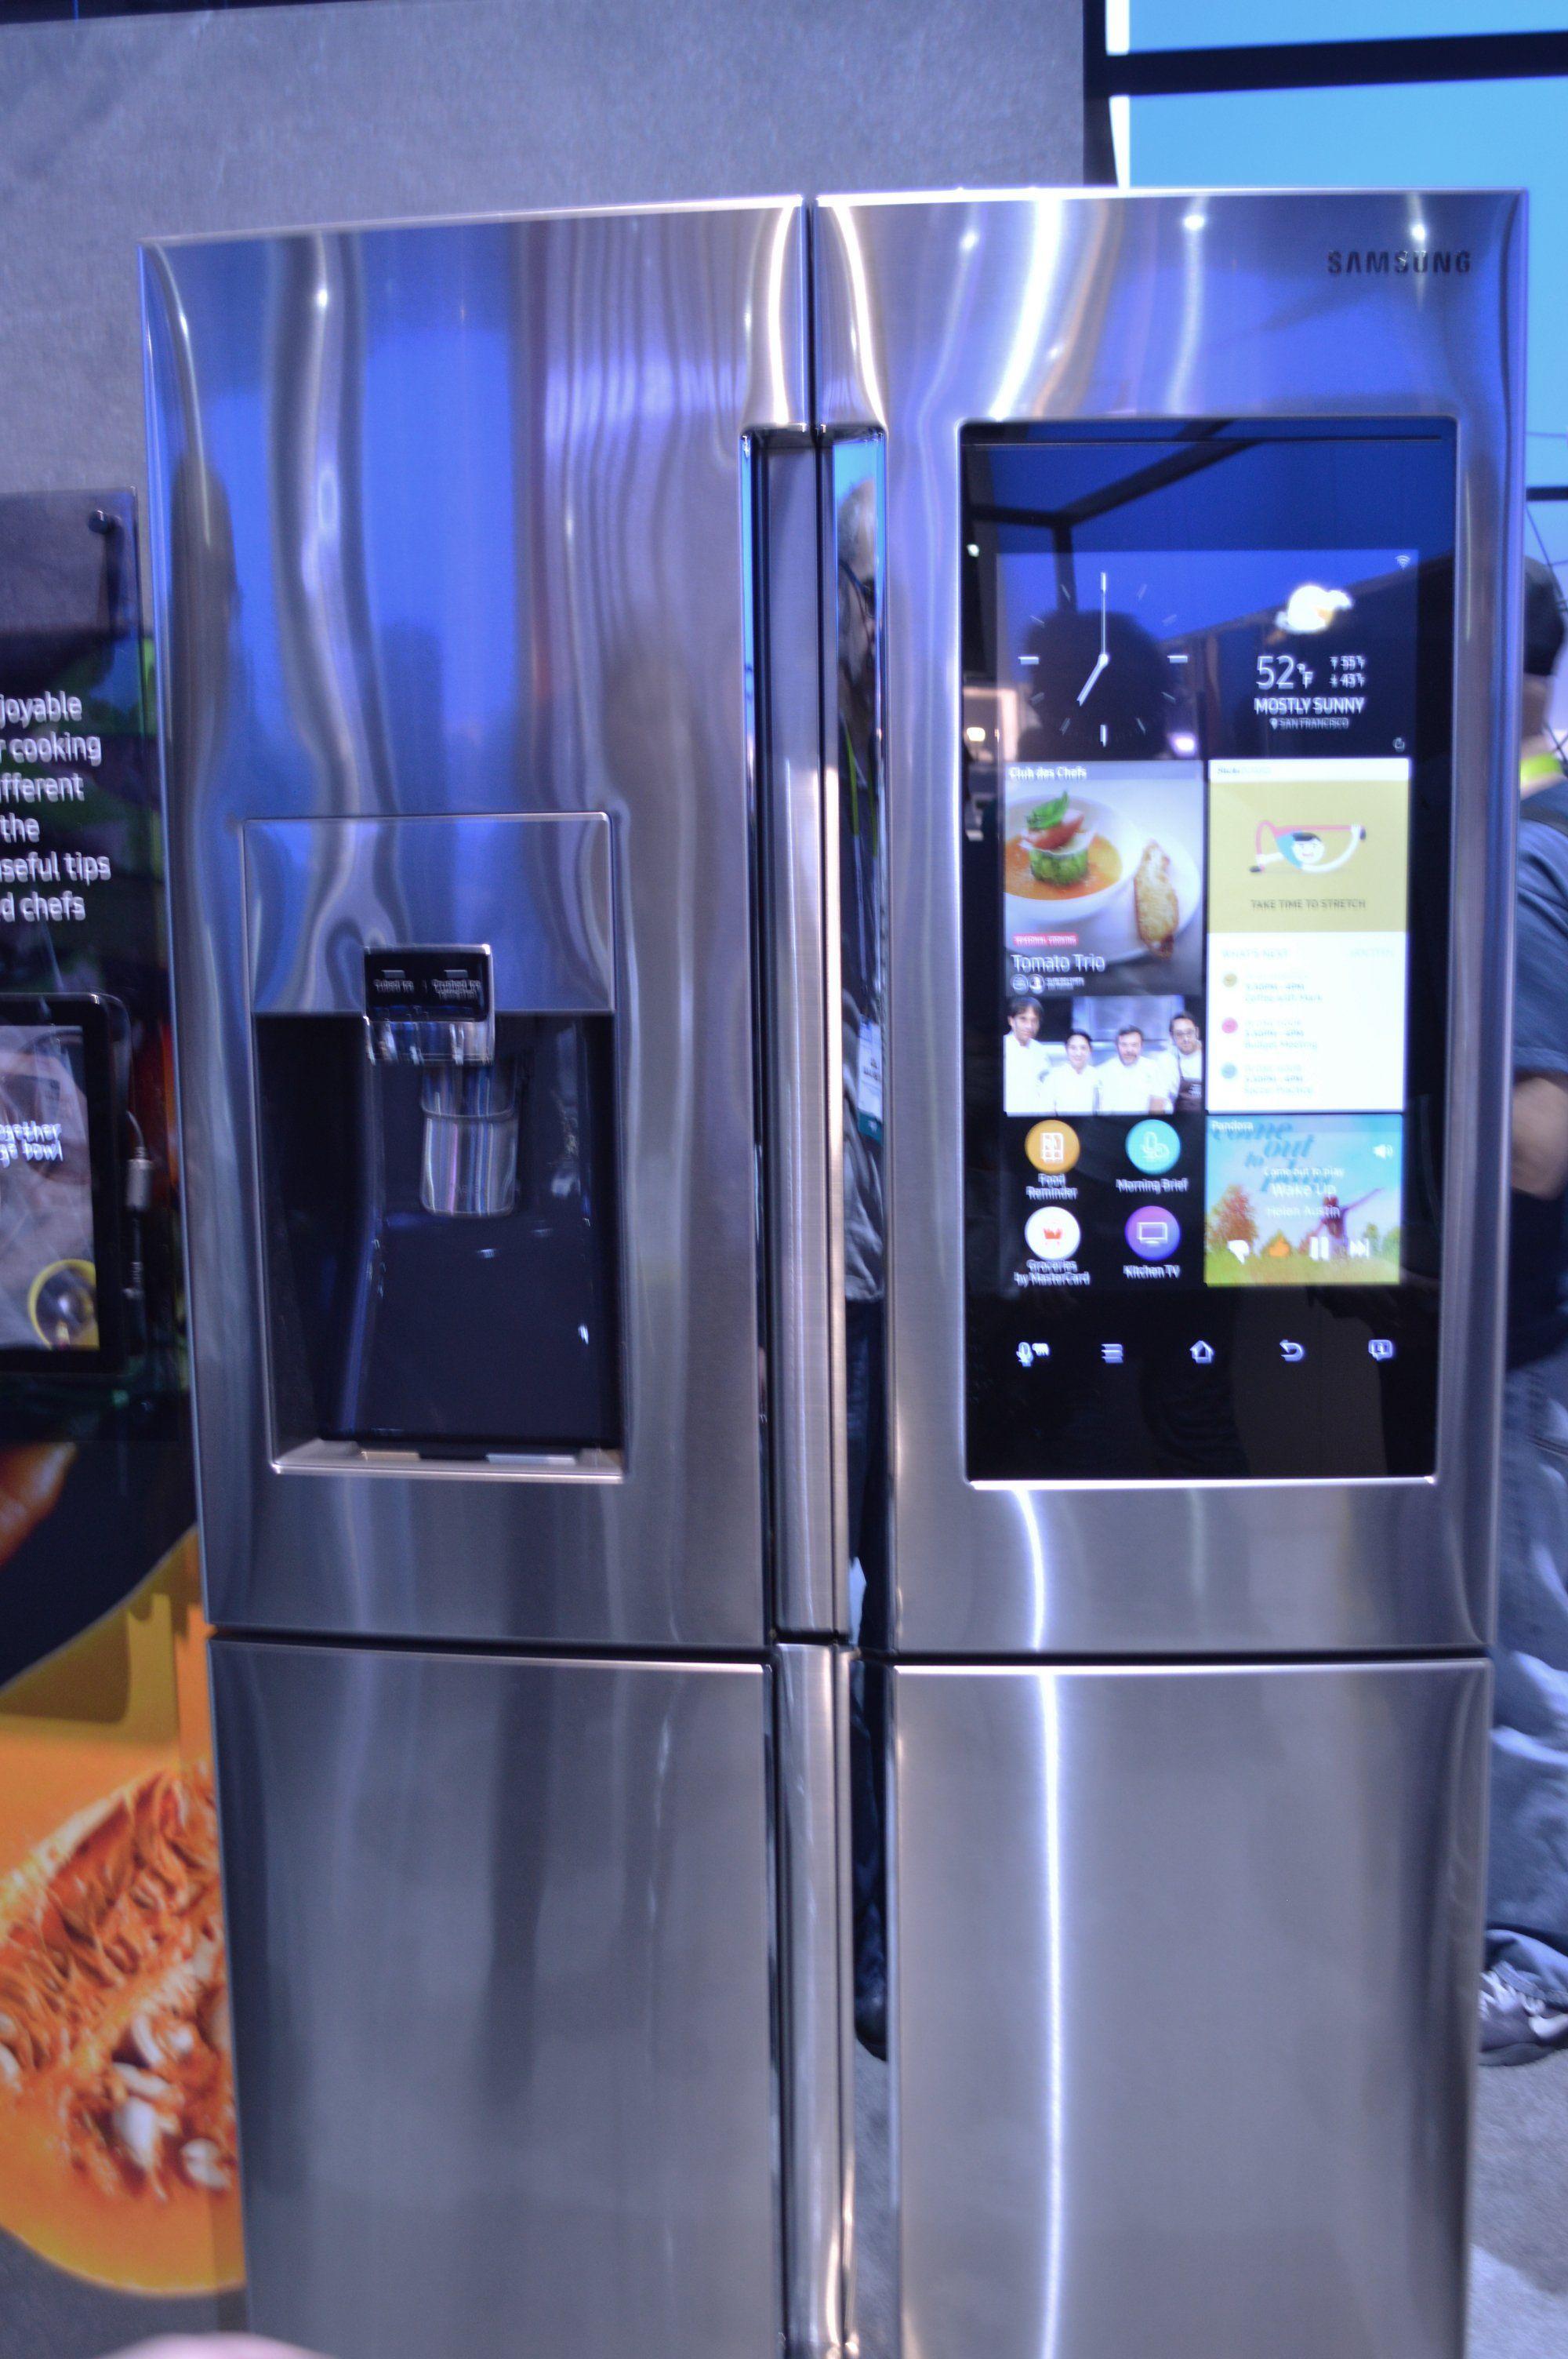 Family Hub Fridge Home gadgets, Home technology, Smart